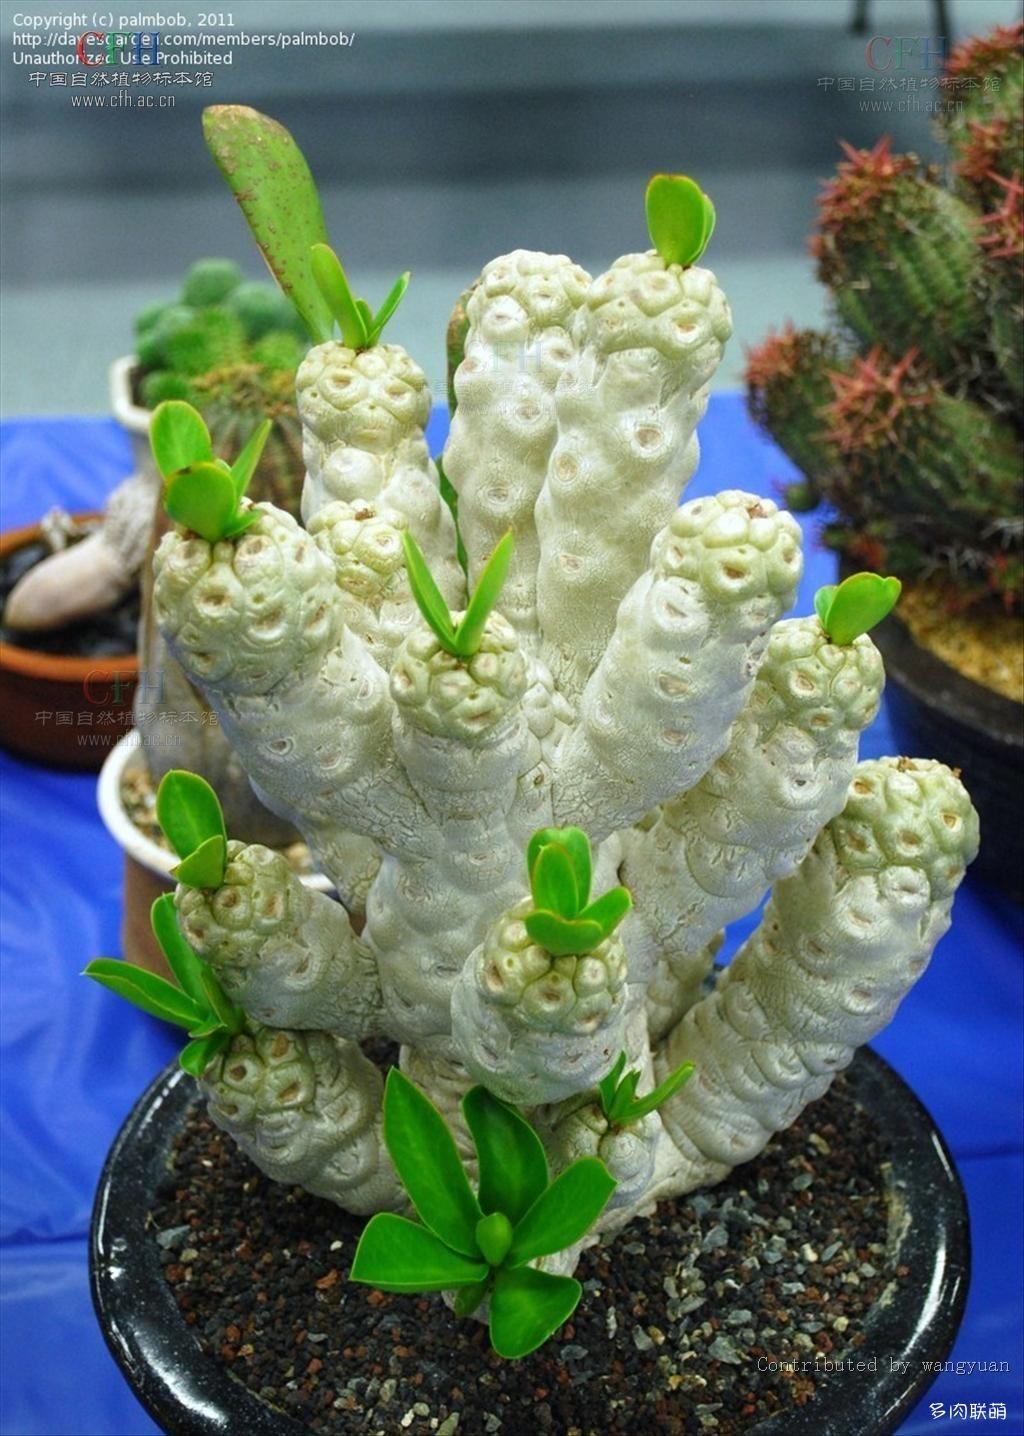 贝信麒麟/幸福麒麟 Euphorbia poissonii